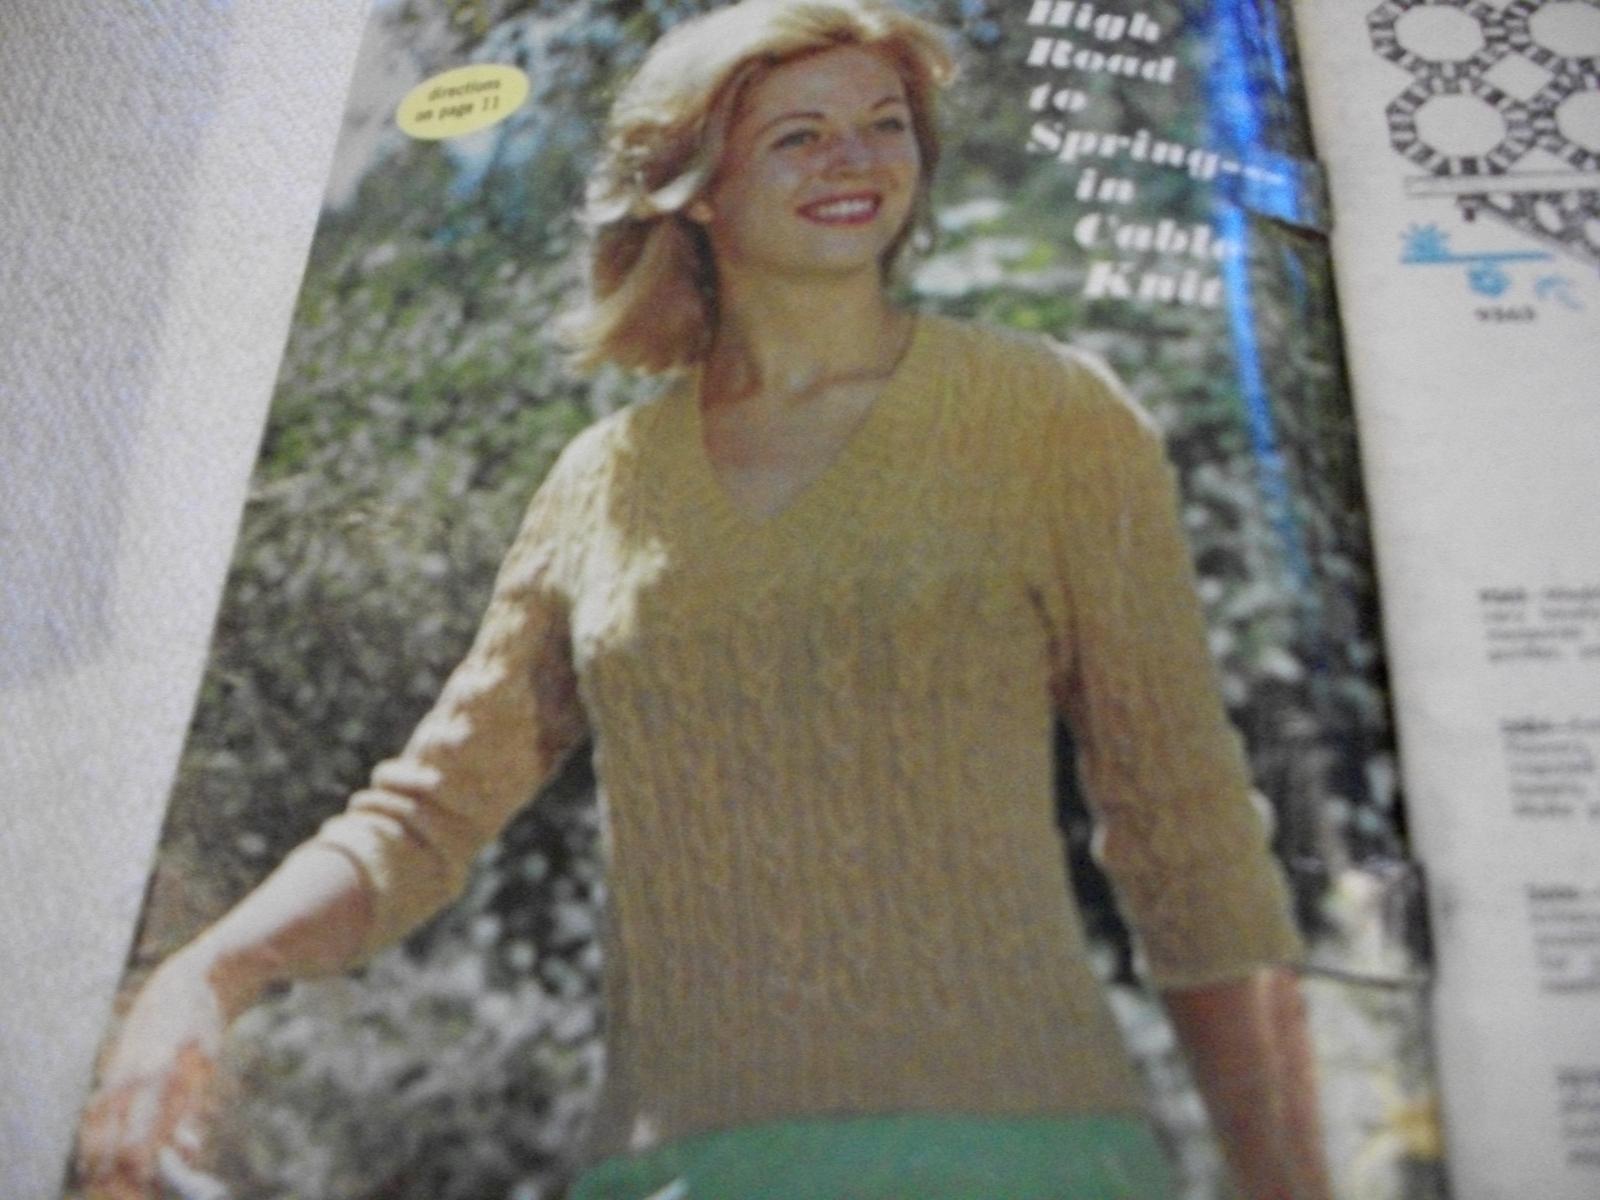 Workbasket Magazine April 1967 and 50 similar items